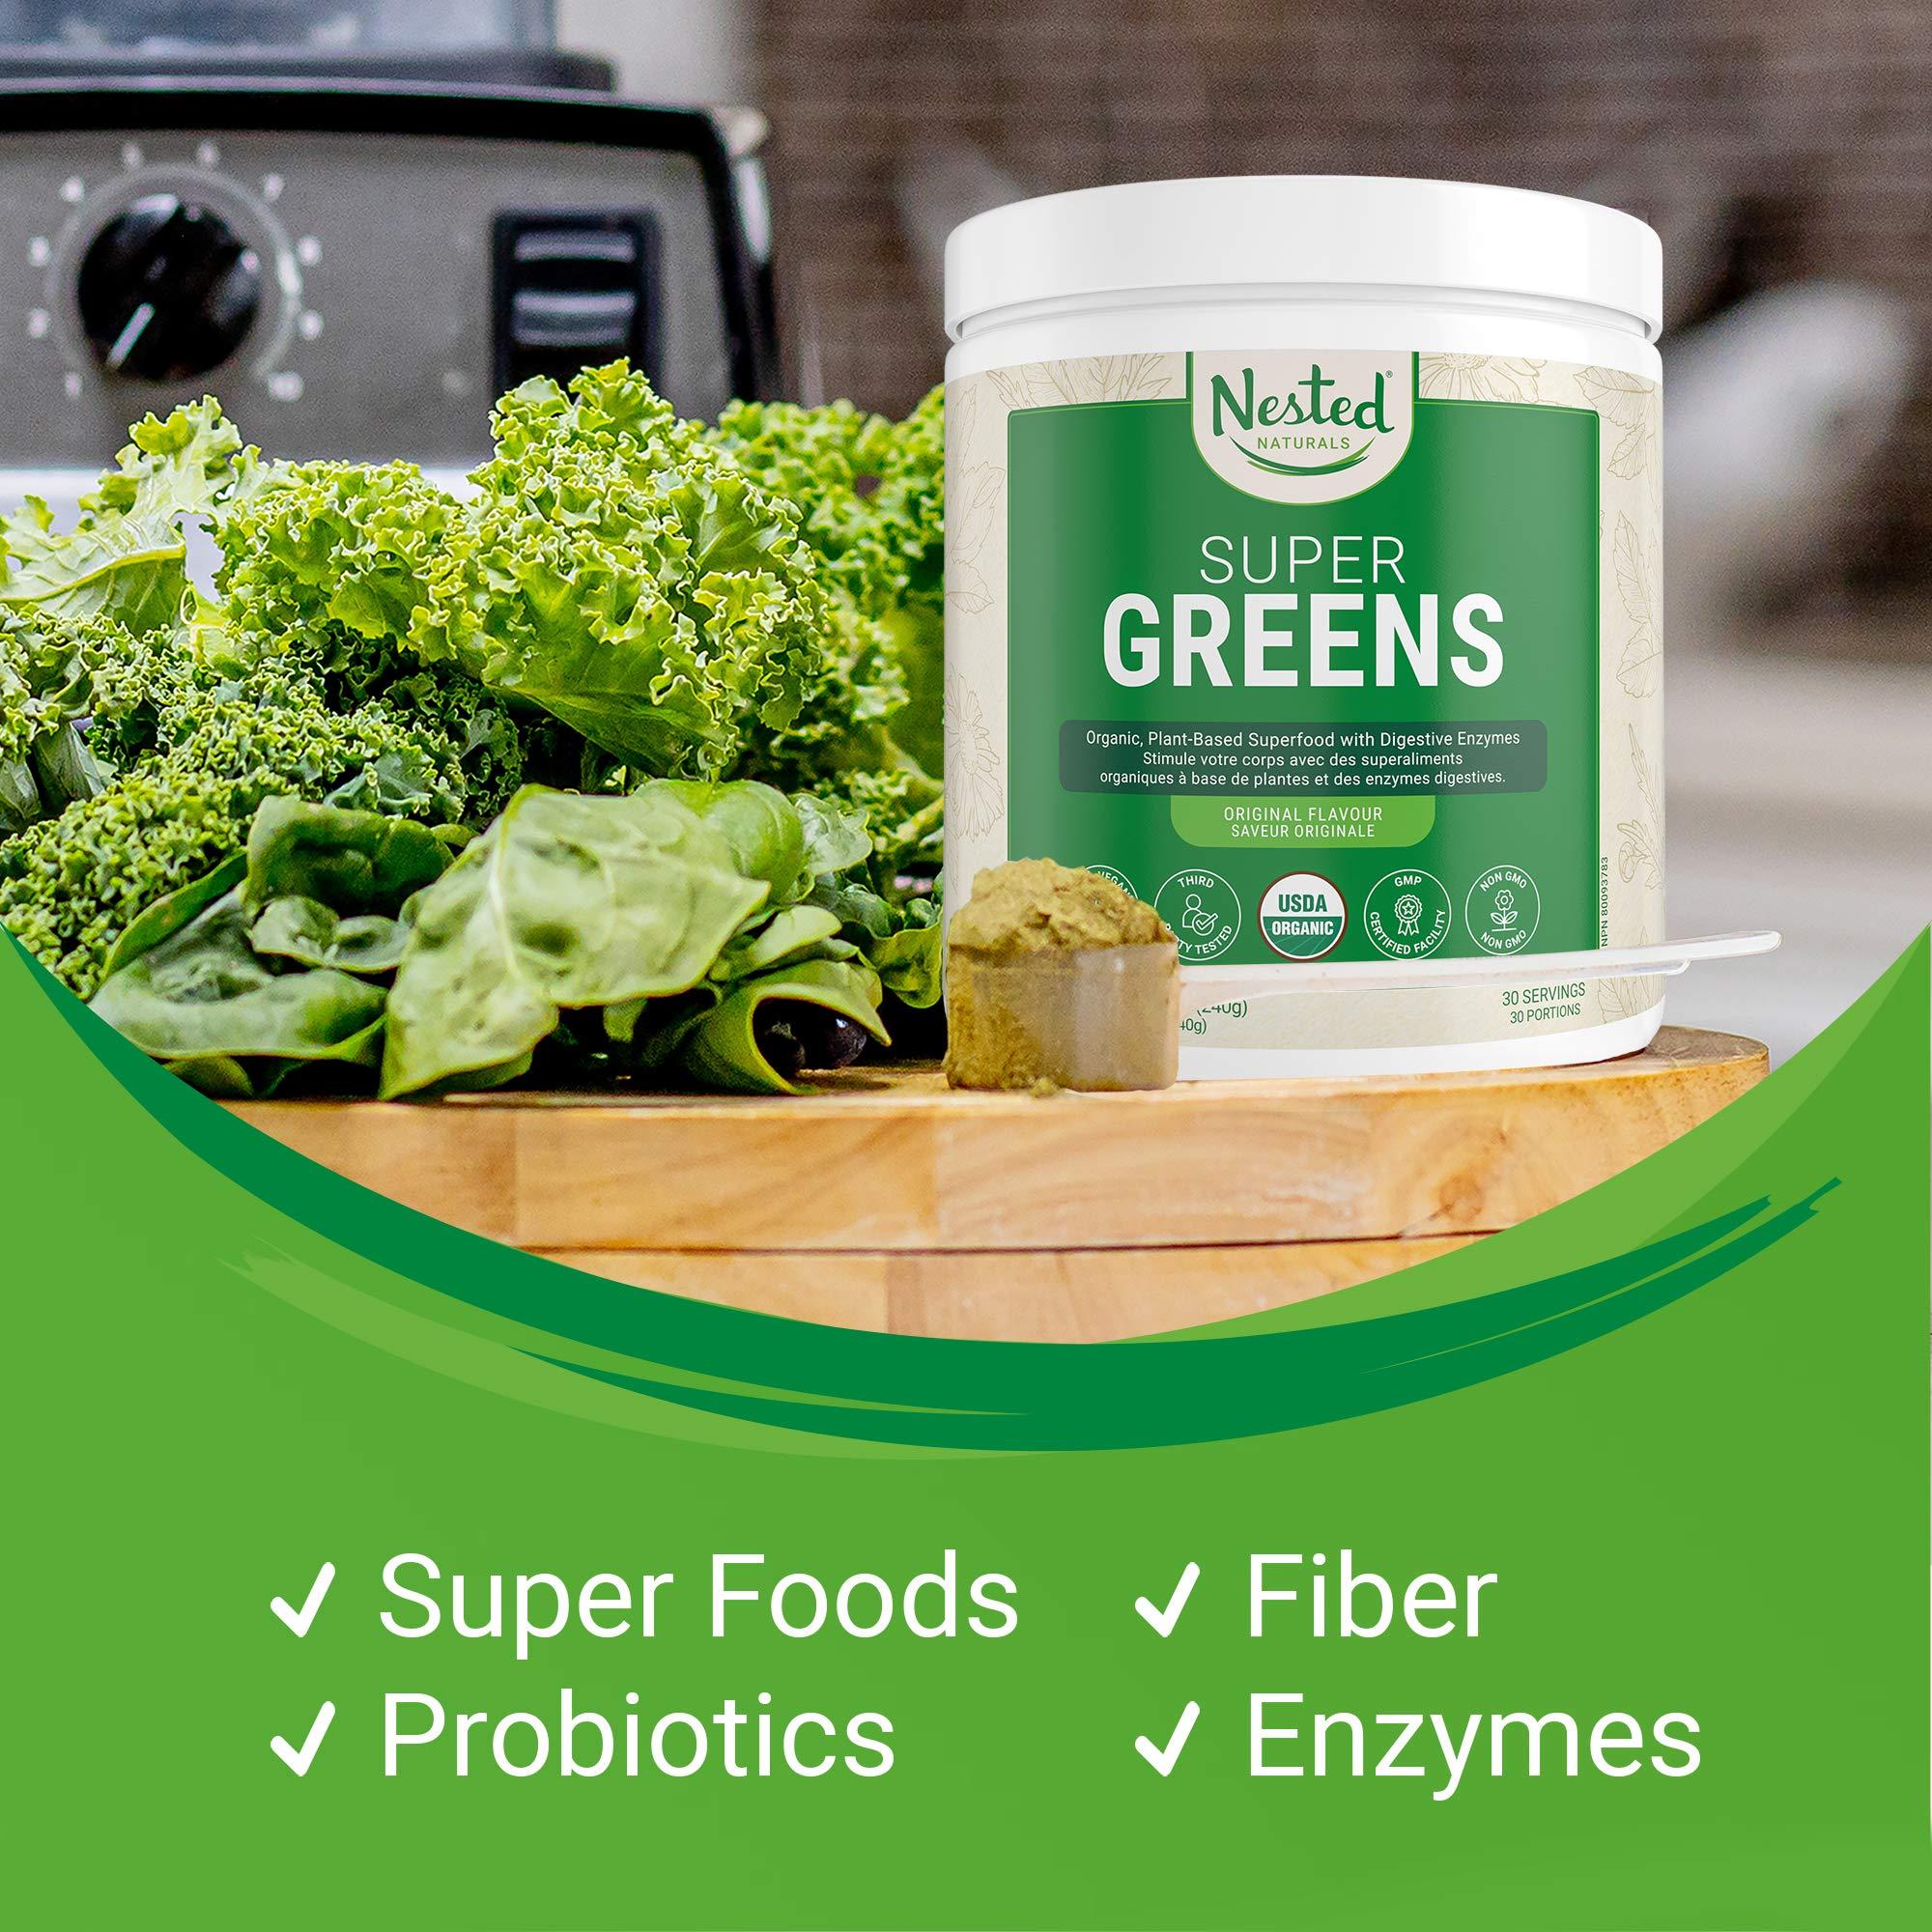 Super Greens | #1 Green Superfood Powder | 100% USDA Organic Non-GMO Vegan Supplement | 30 Servings | 20+ Whole Foods (Spirulina, Wheat Grass, Barley), Probiotics, Fiber & Enzymes (Original)